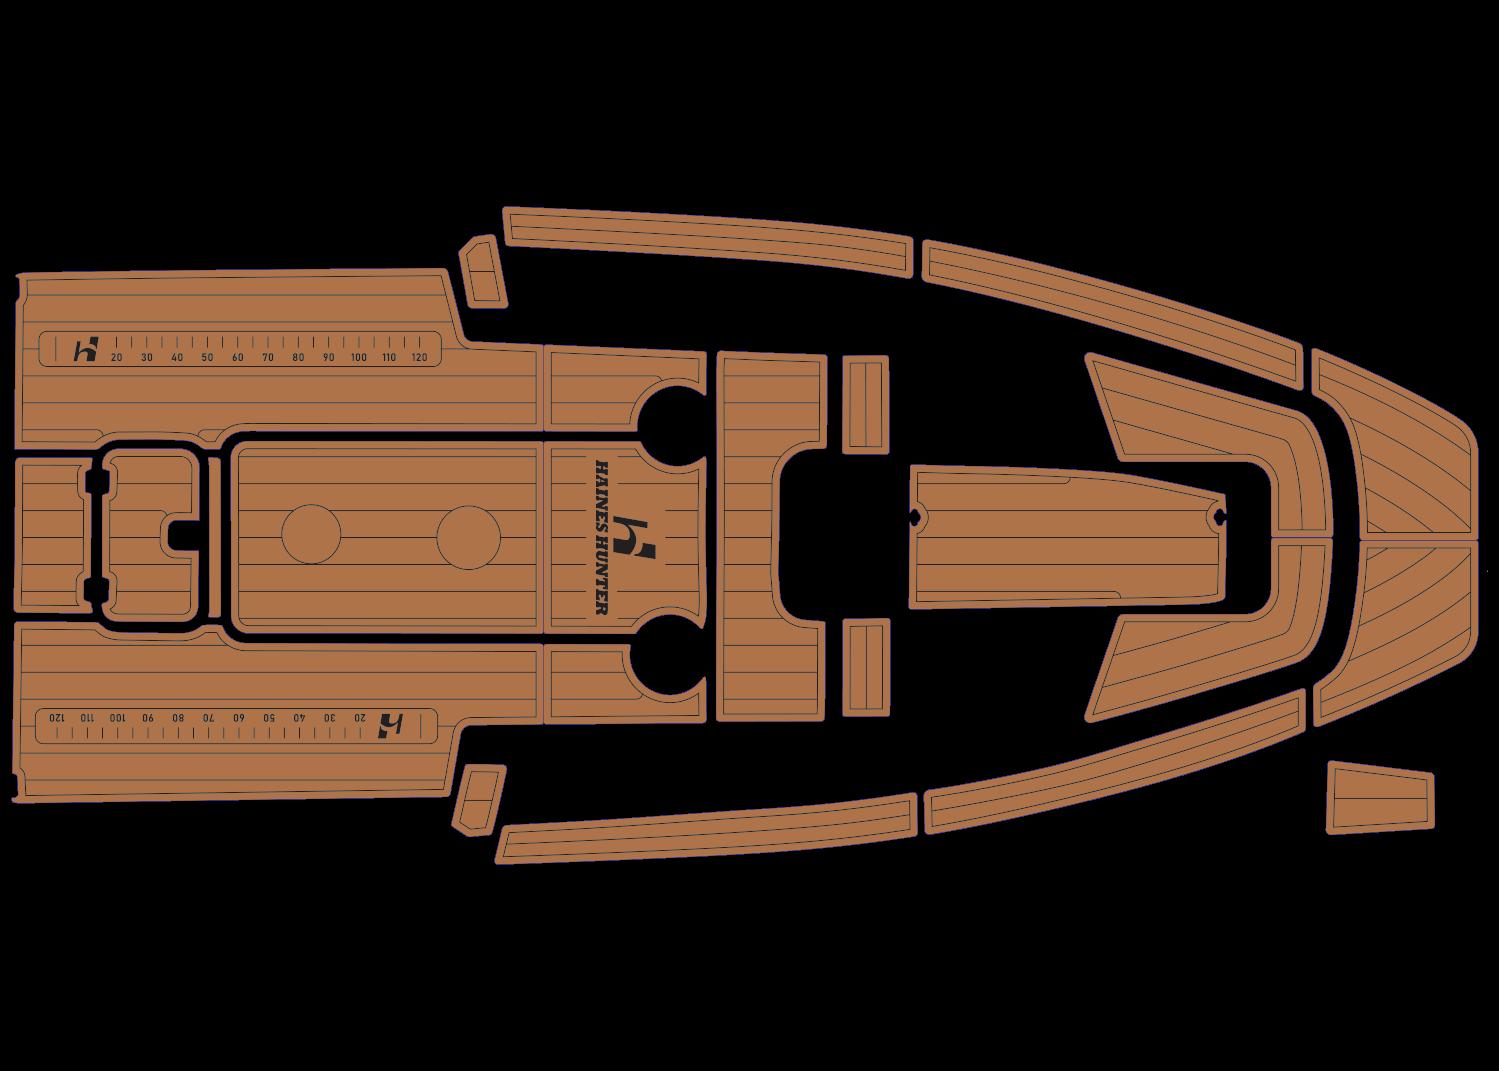 Haines Hunter 680 SF udek boat flooring